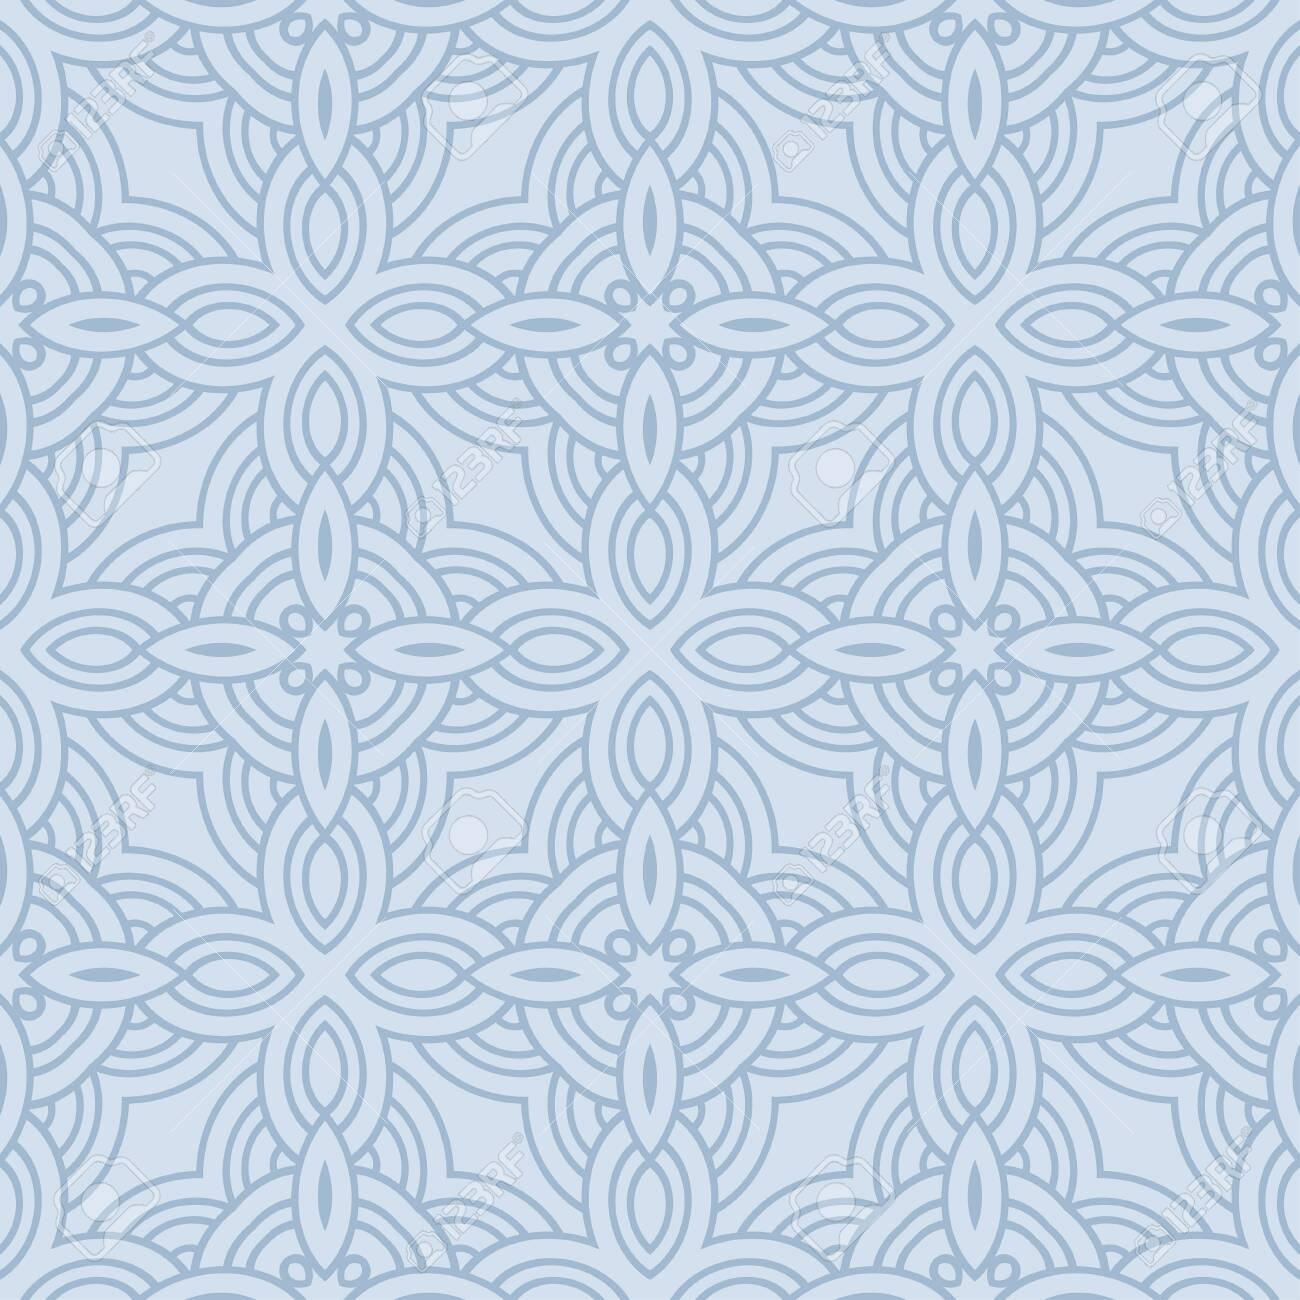 Unique, Abstract Geometric Color Pattern. Seamless Vector Illustration. For Fantastic Design, Wallpaper, Background, Fantastic Print - 122888282